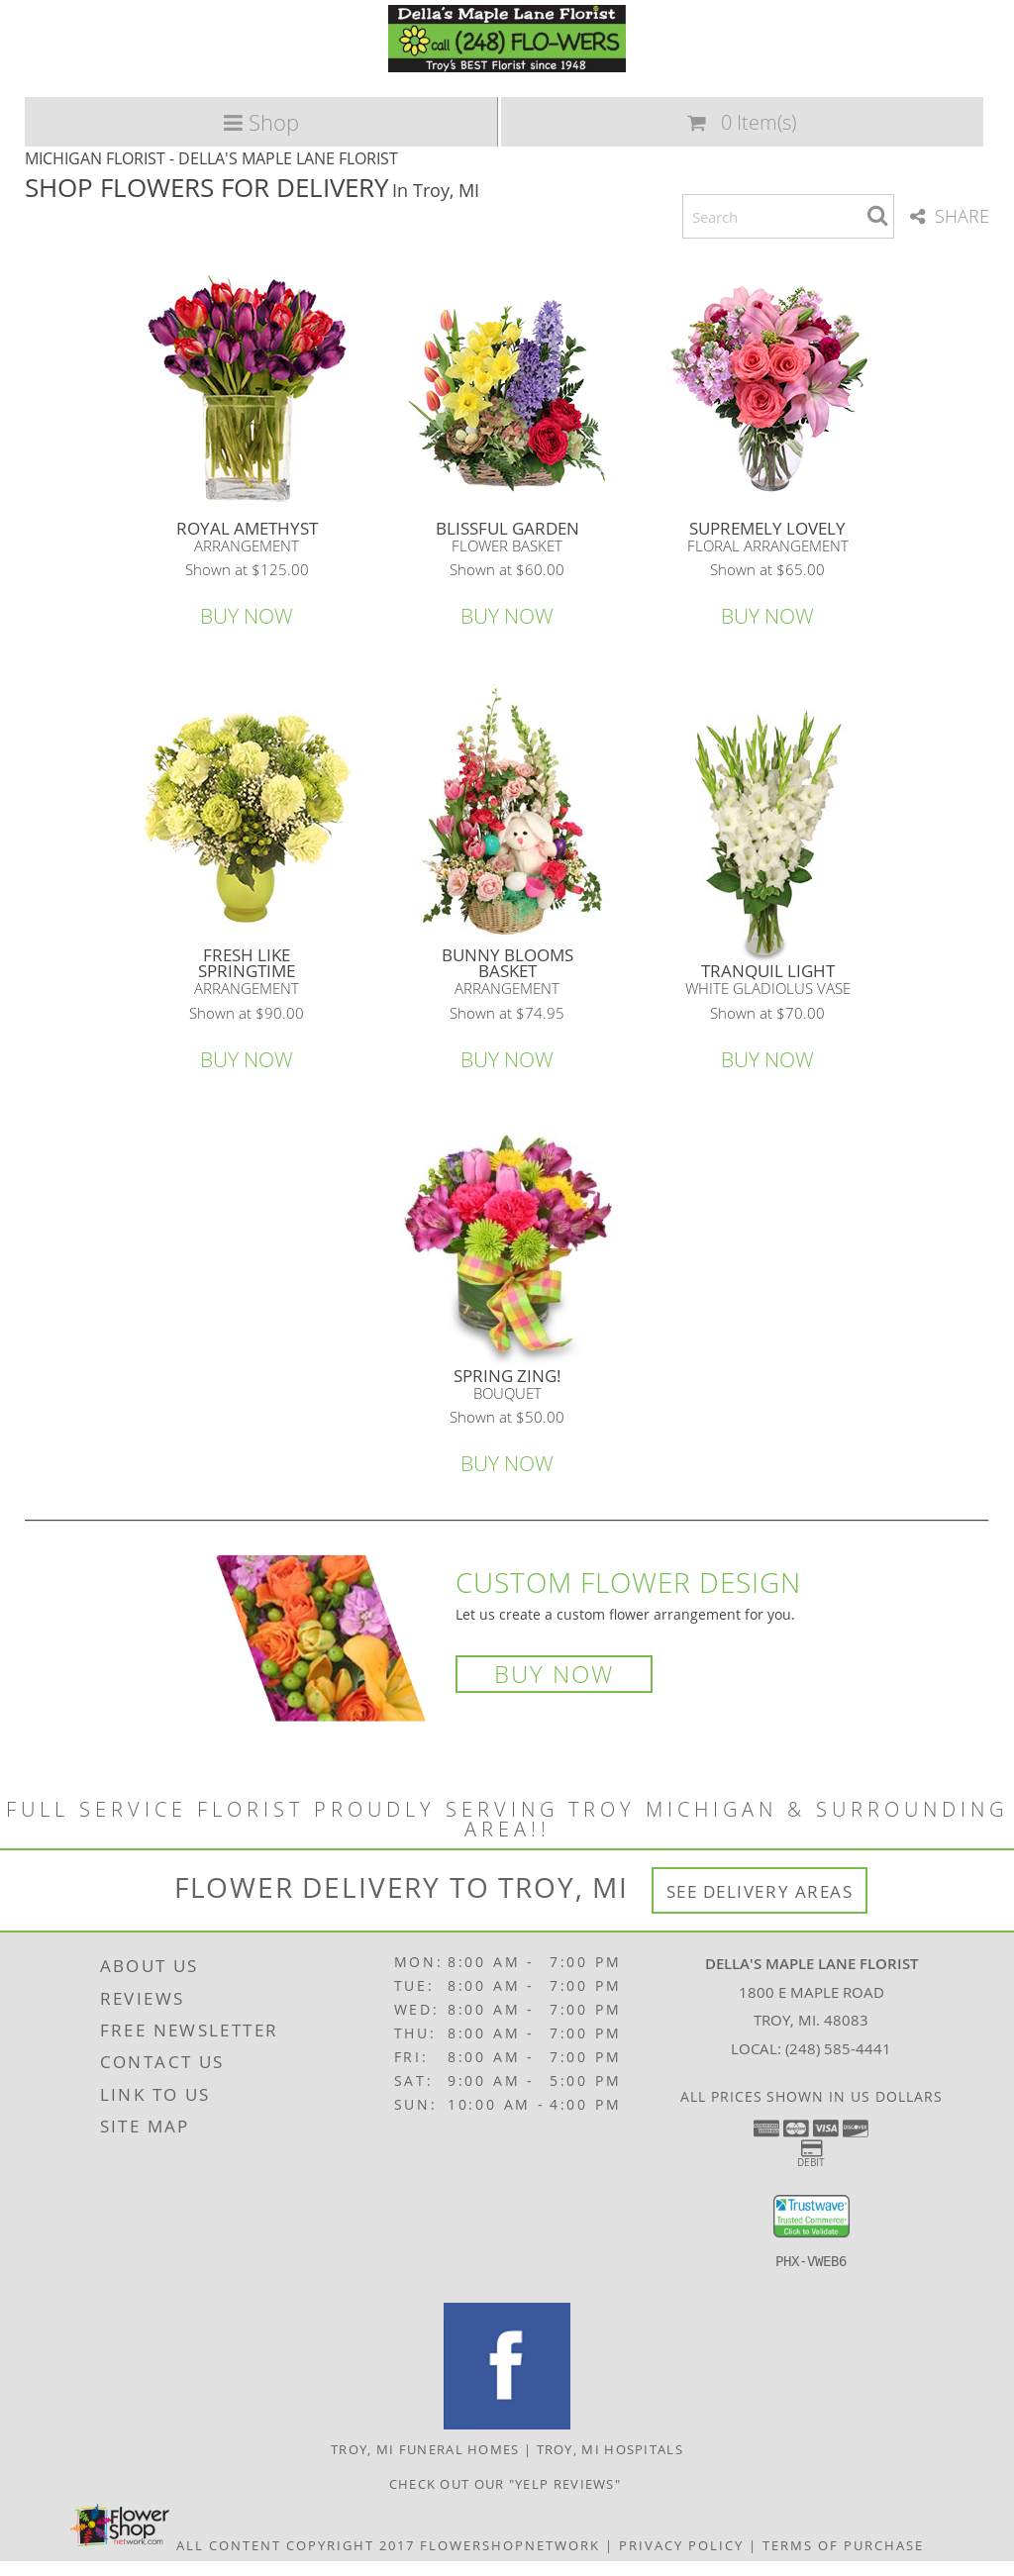 dellas maple lane florist competitors, revenue and employees - owler